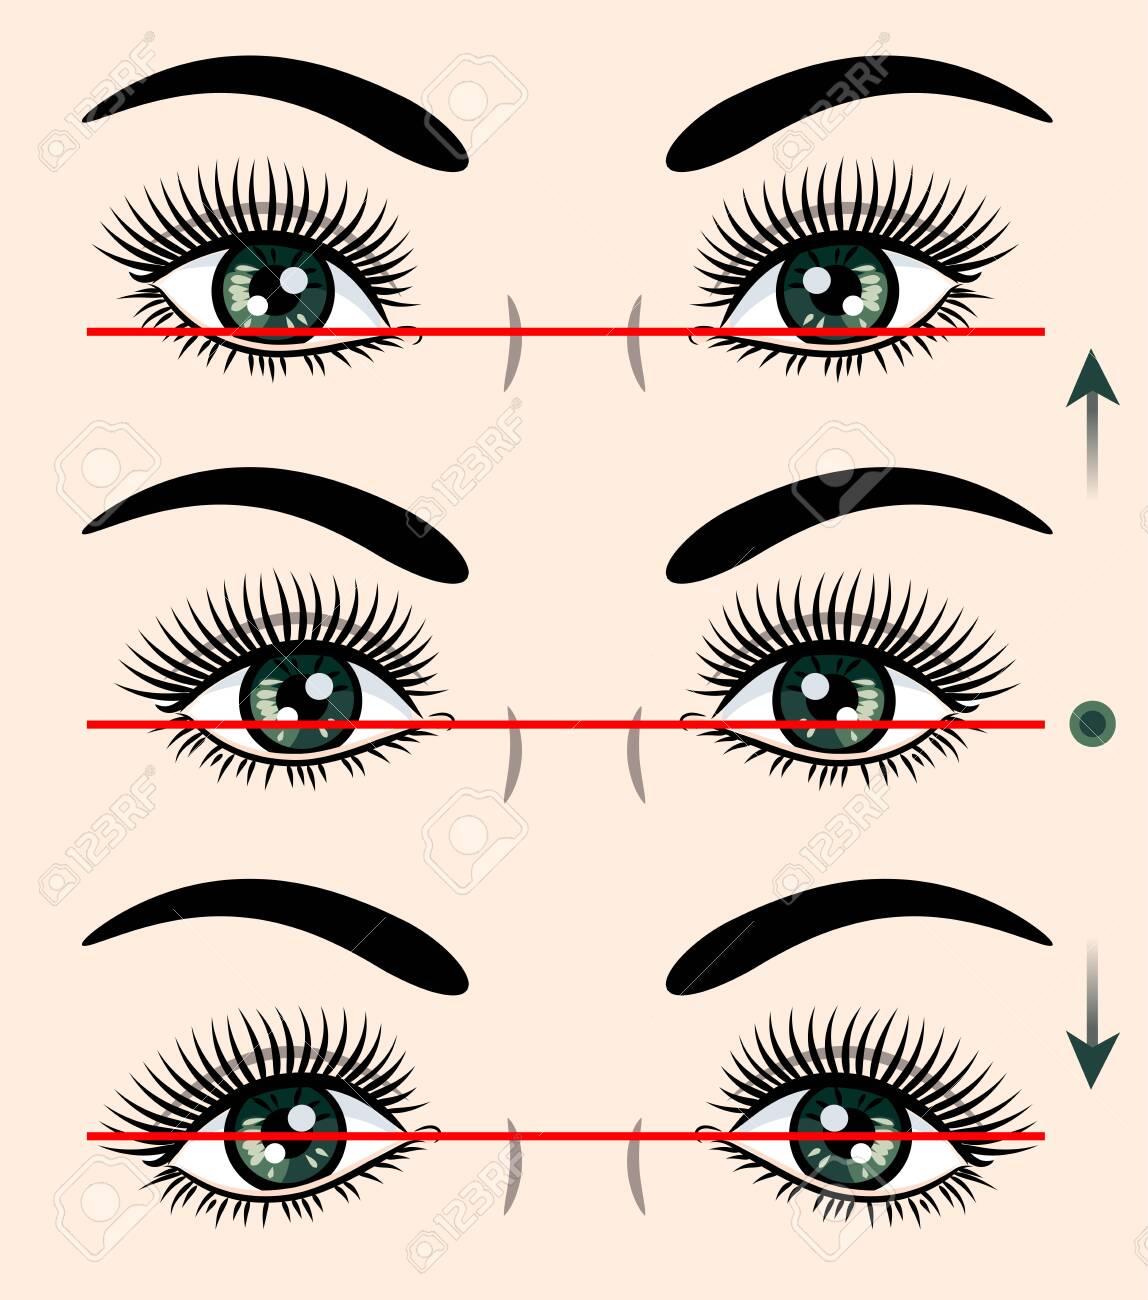 Various forms of human eyes - 130800612